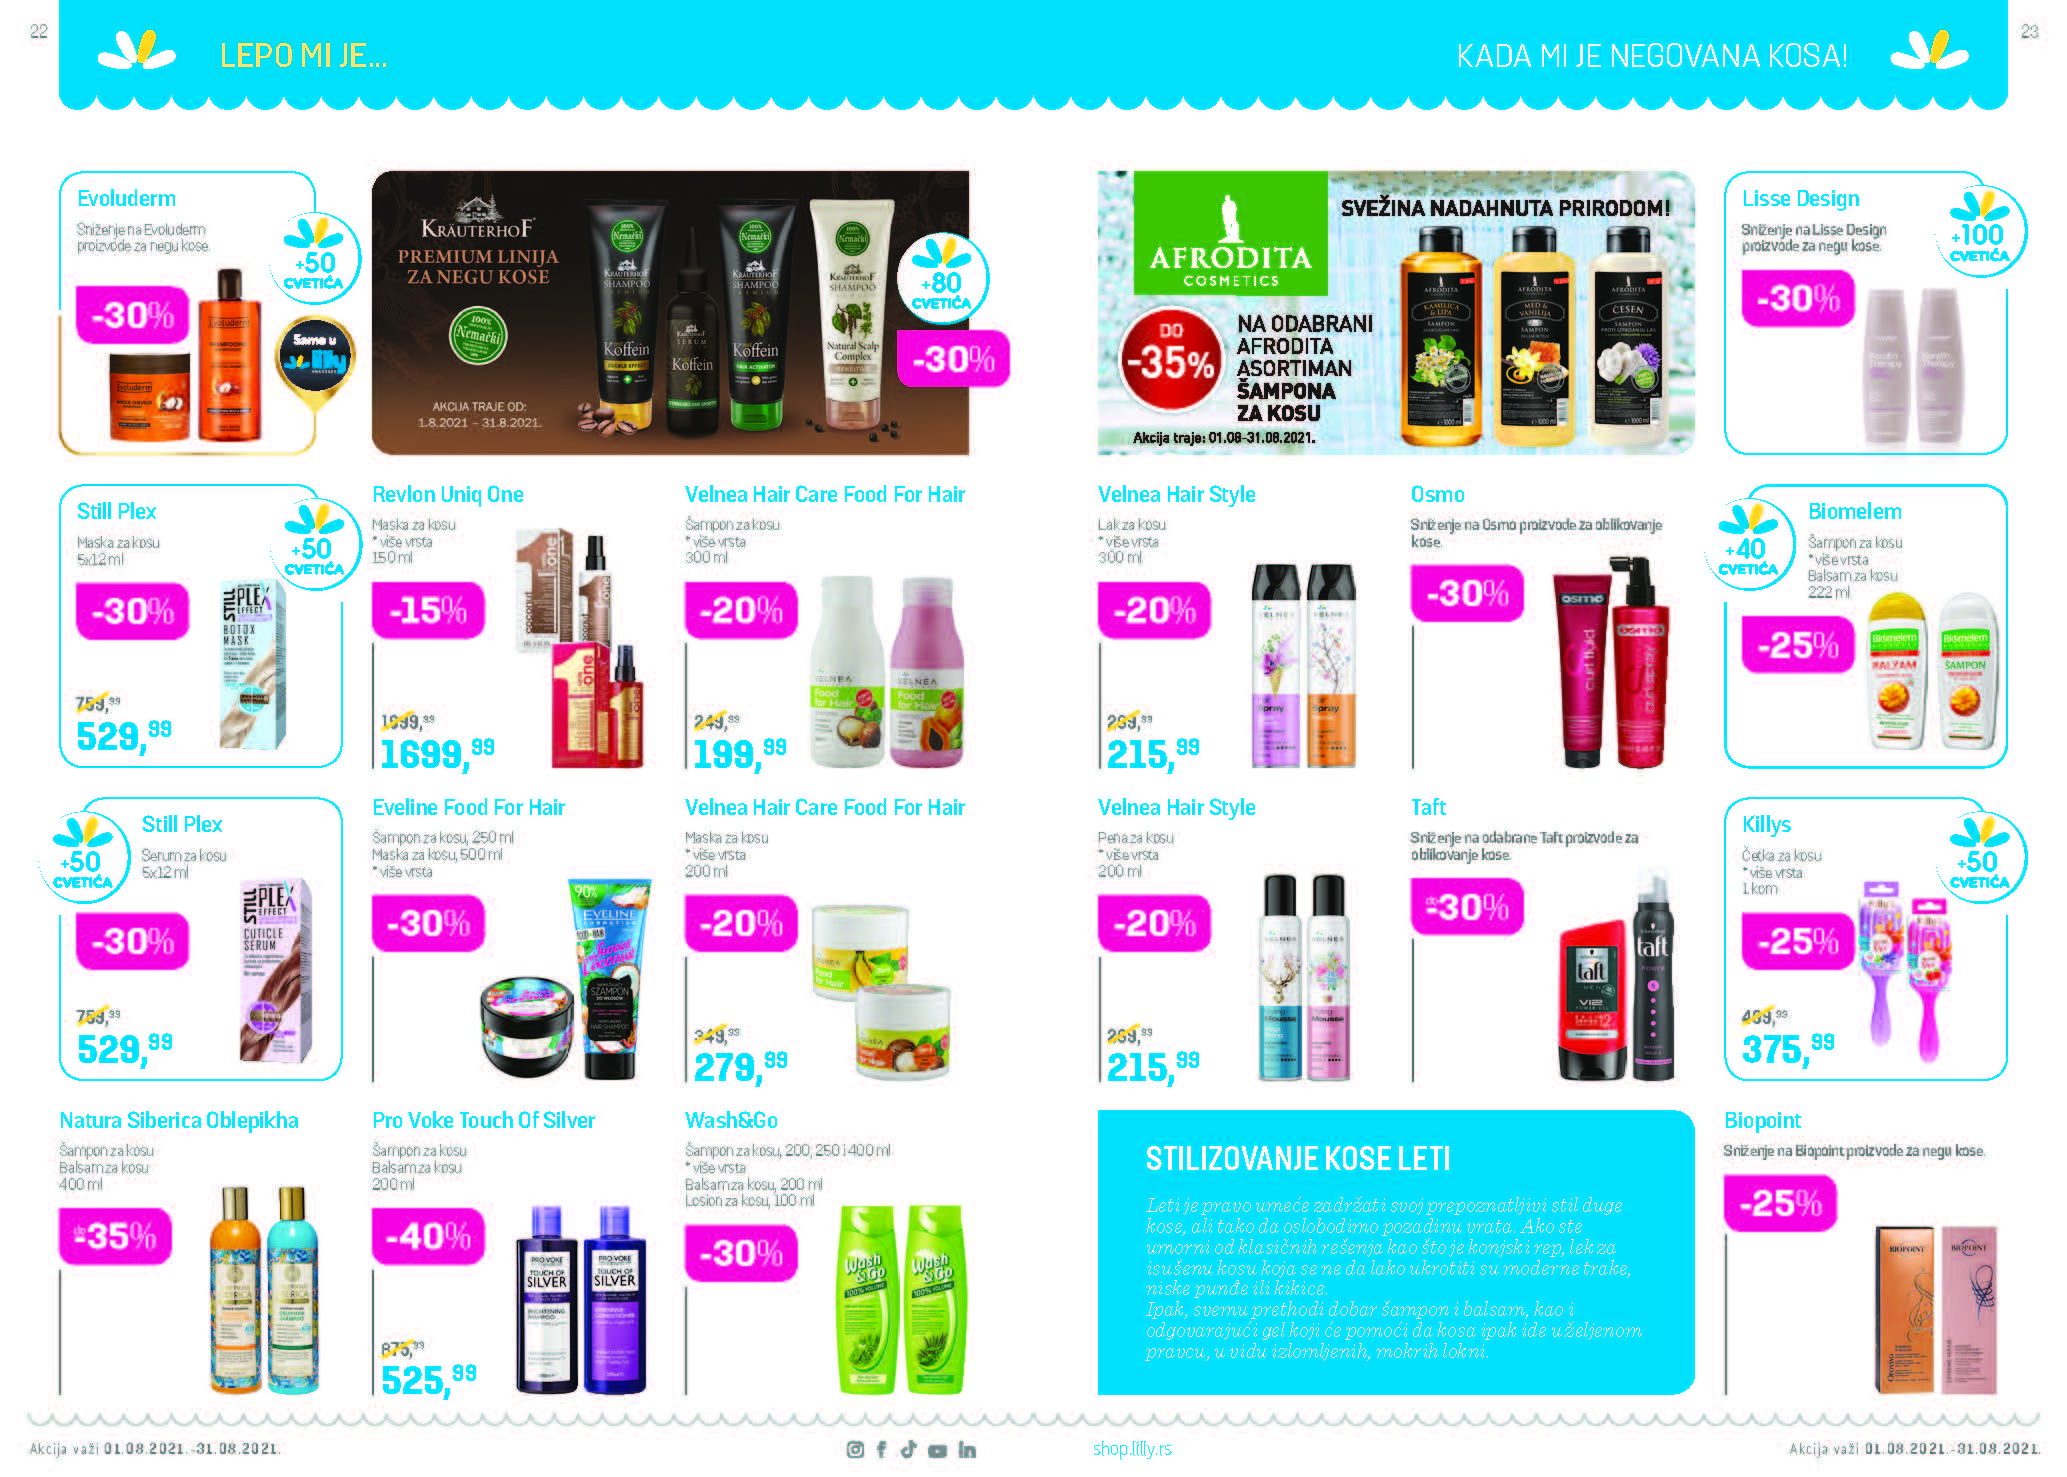 LILLY Katalog LILLY ONLINE AKCIJA AVGUST 2021 1.8. 31.8. Page 12